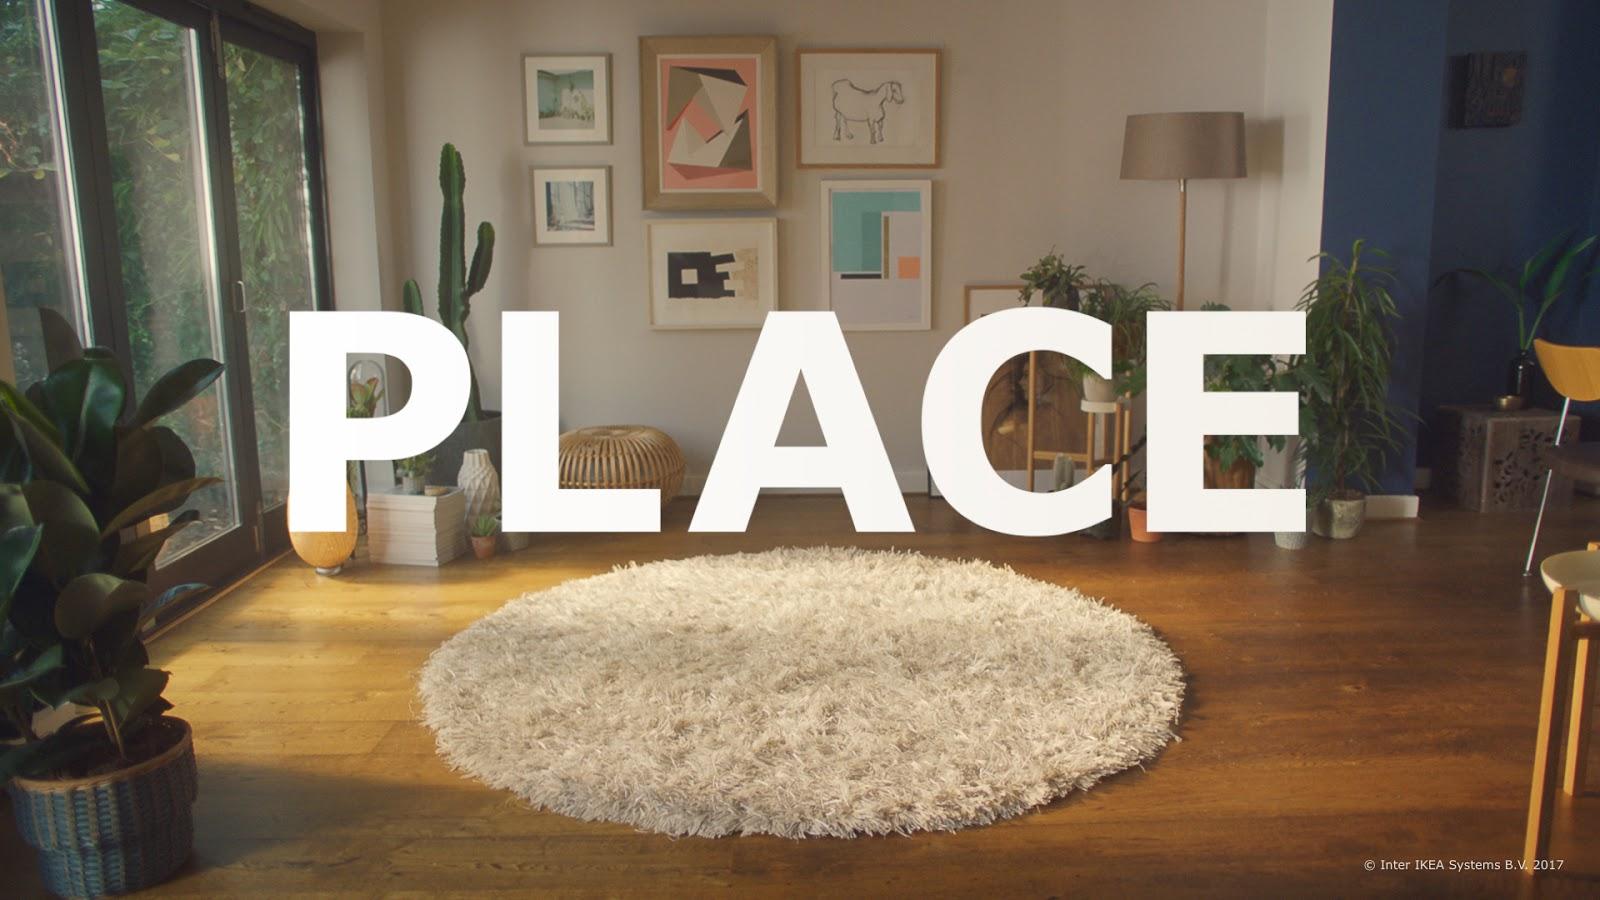 augmented reality app ikea place home art magazine. Black Bedroom Furniture Sets. Home Design Ideas